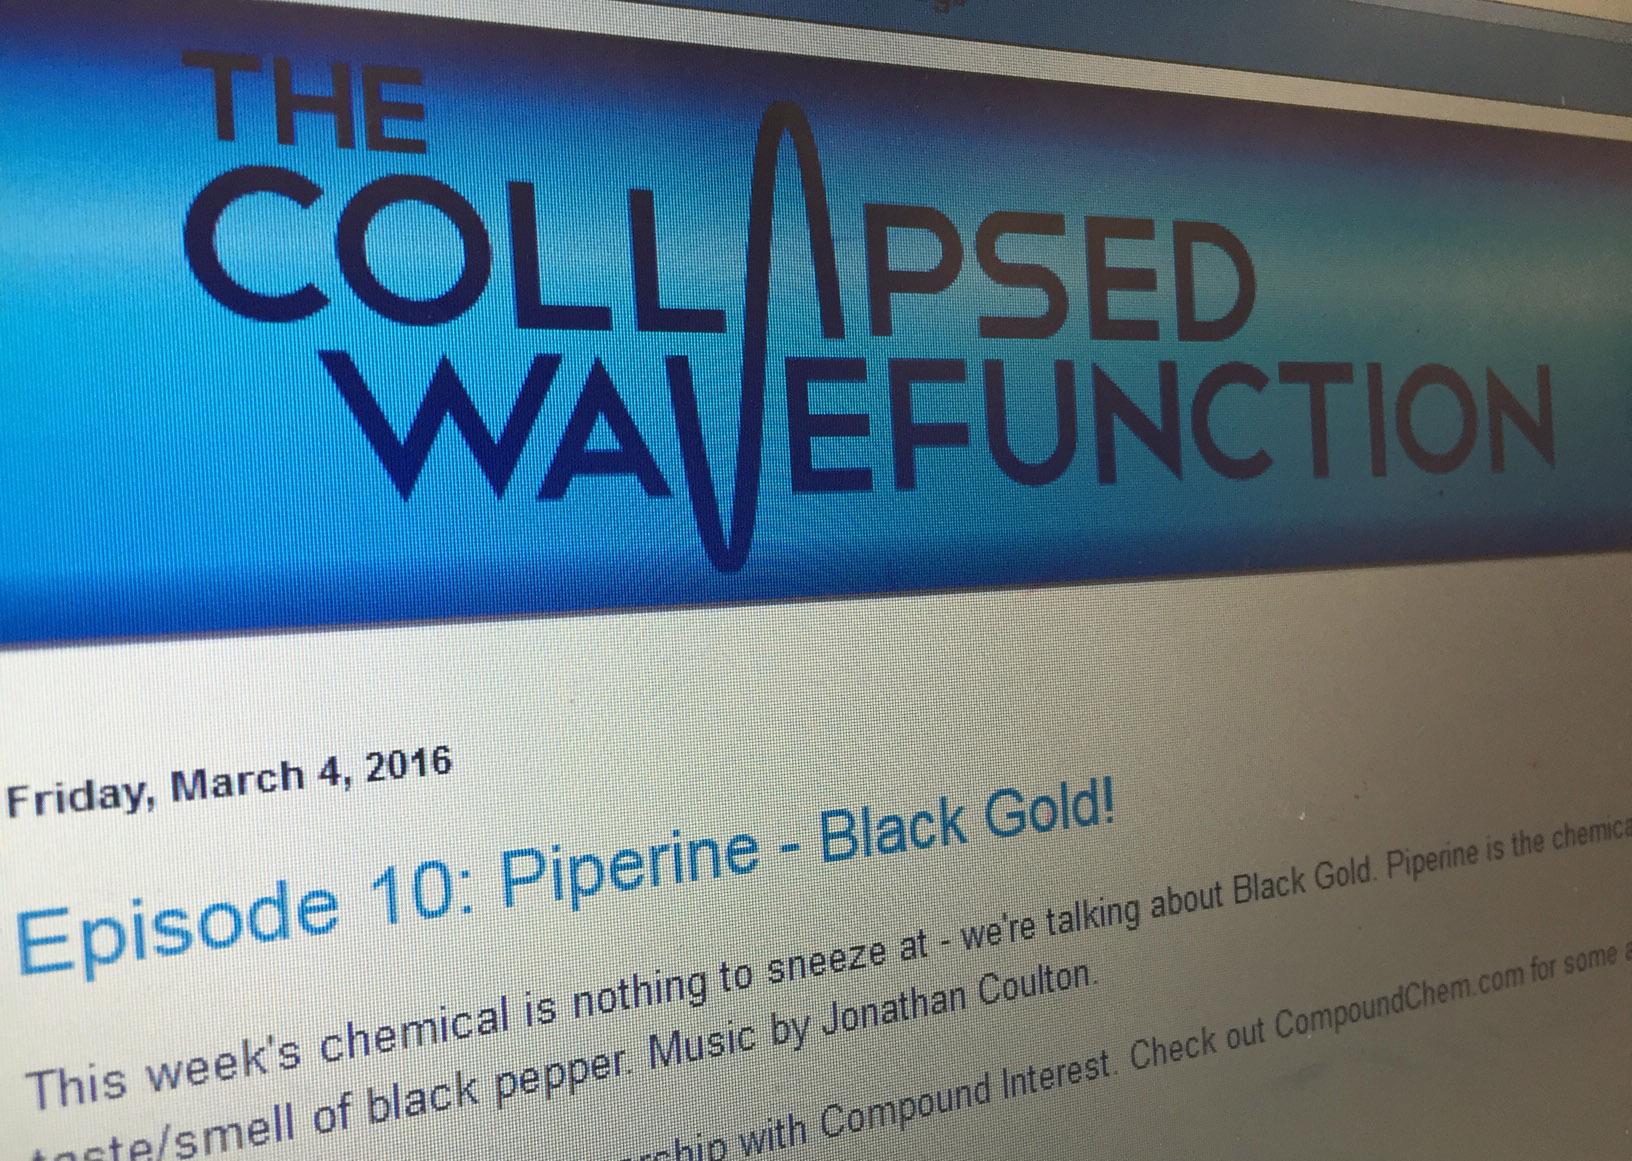 collapsed wavefunction logo